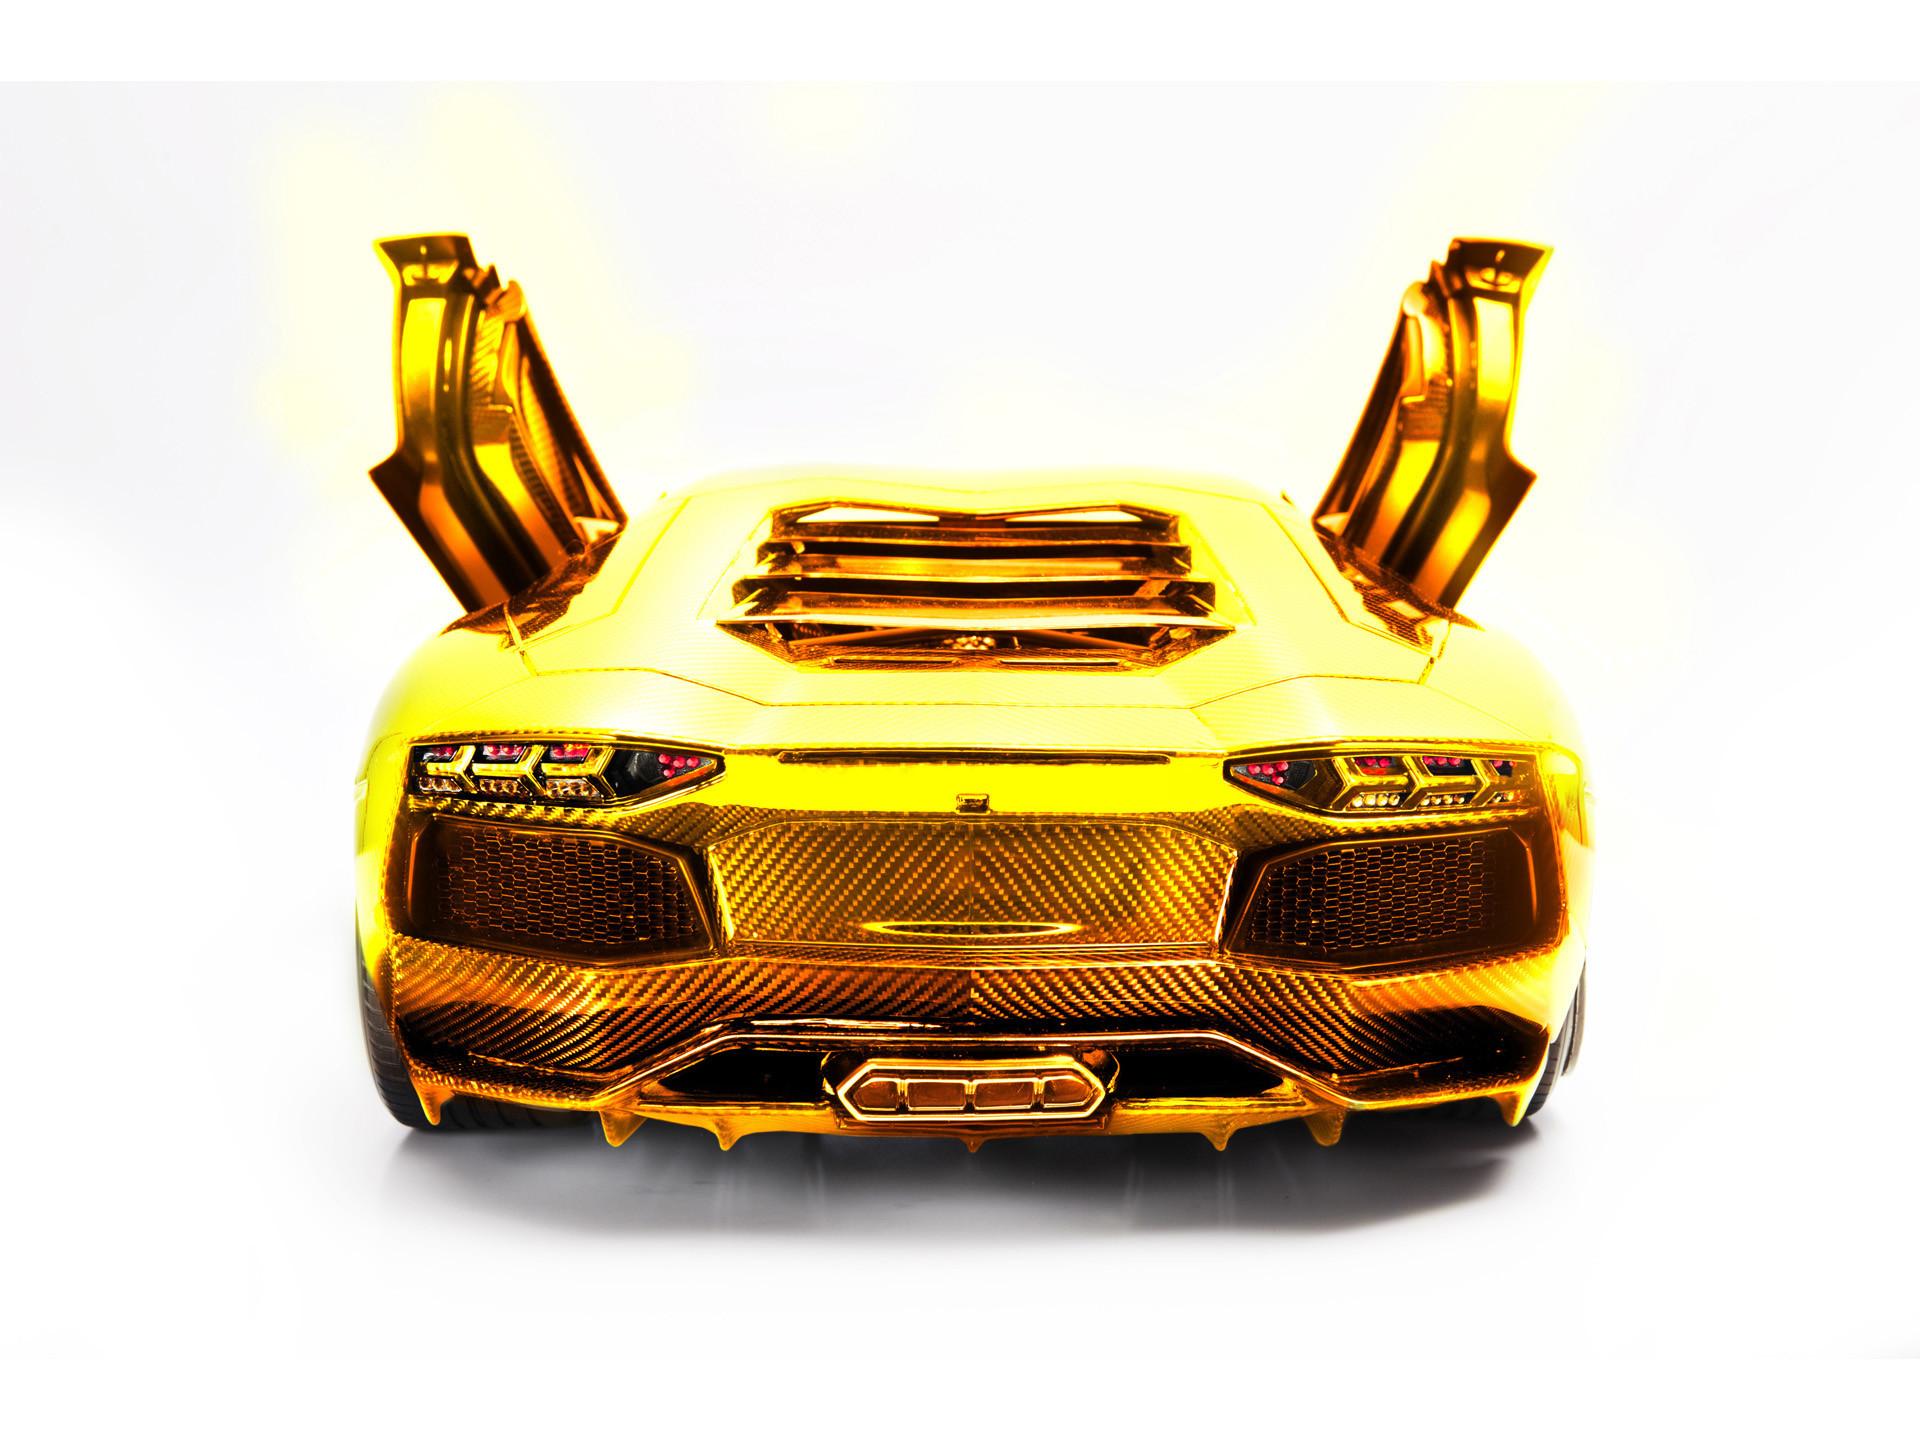 Res: 1920x1440, 2012 Lamborghini Aventador LP 700-4 Model by Robert Gulpen Engineering -  Gold Rear Open Doors -  - Wallpaper